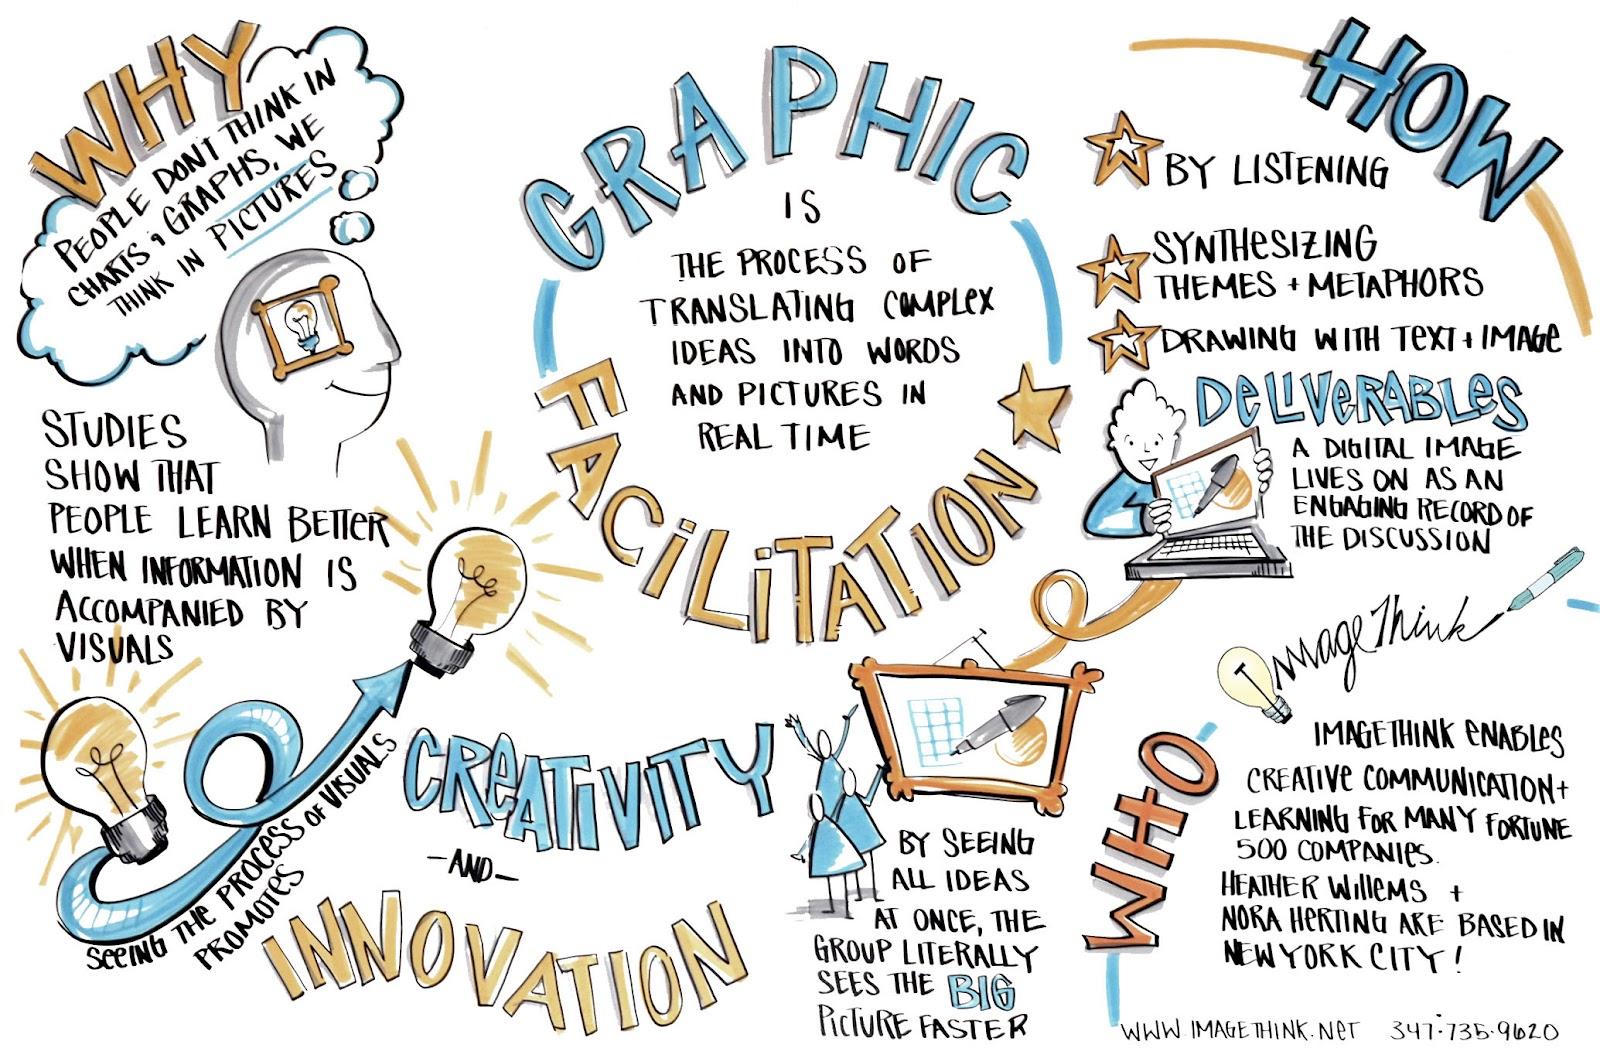 Innovation Design In Education - ASIDE: ImageThink ...